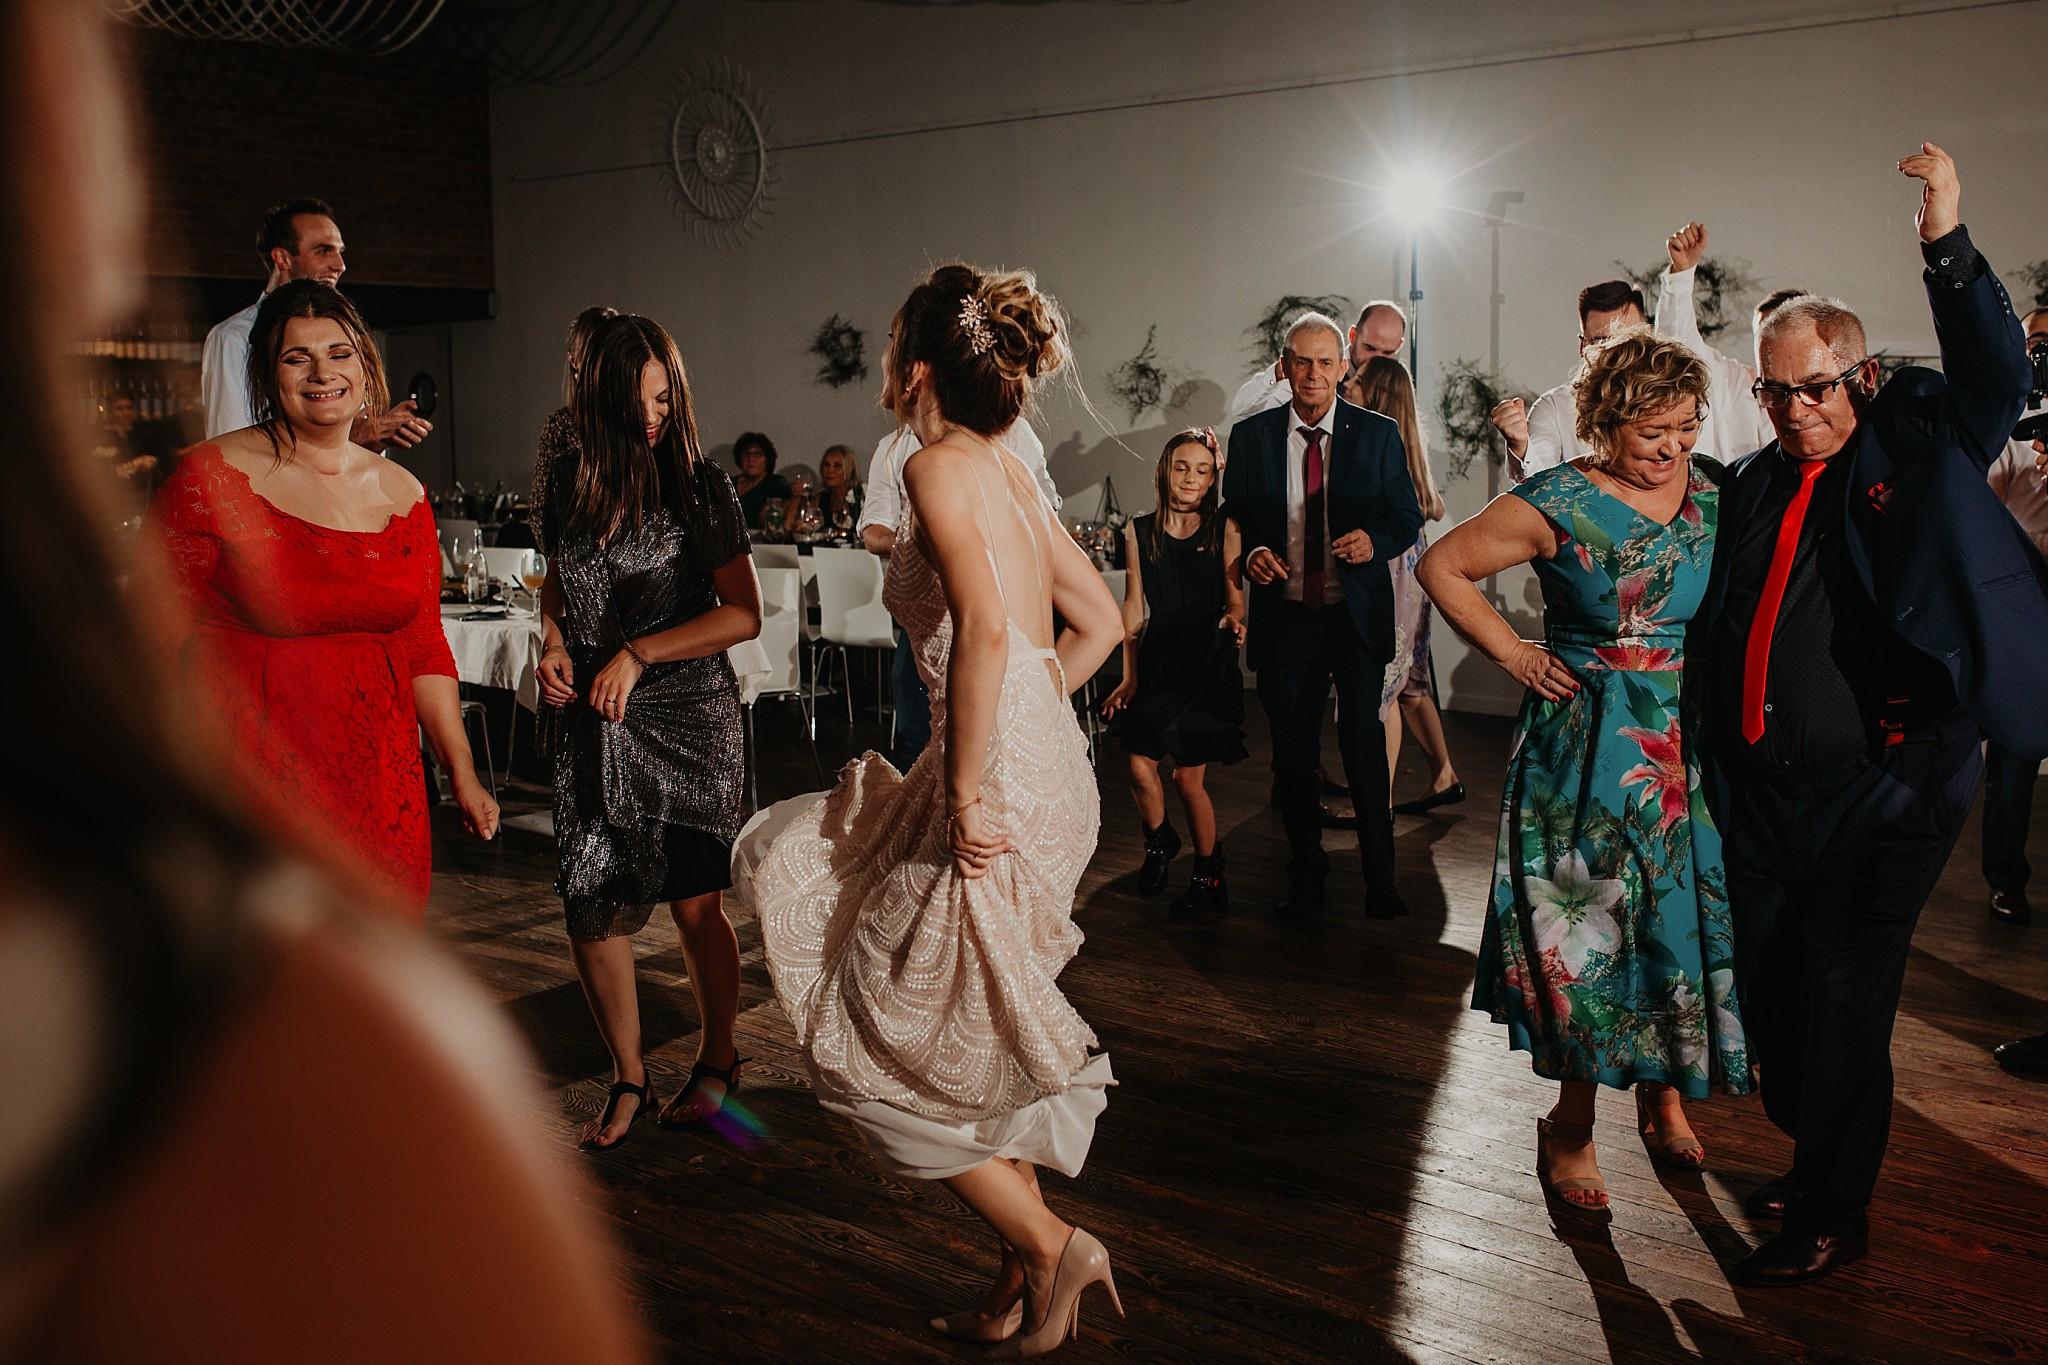 fotograf poznan wesele dobra truskawka piekne wesele pod poznaniem wesele w dobrej truskawce piekna para mloda slub marzen slub koronawirus slub listopad wesele koronawirus 484